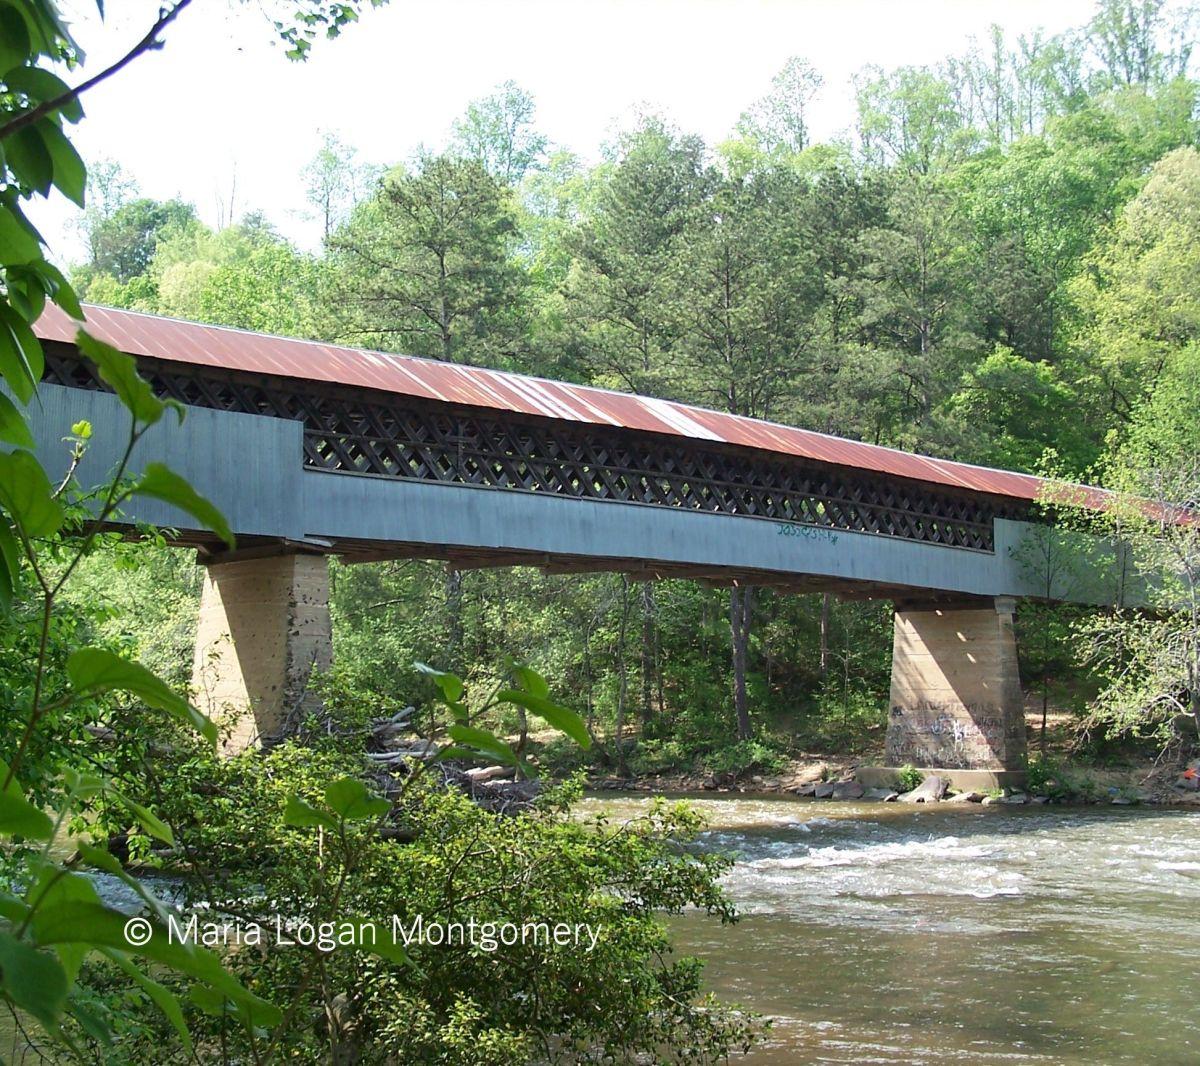 Blount County, Alabama's Covered Bridges